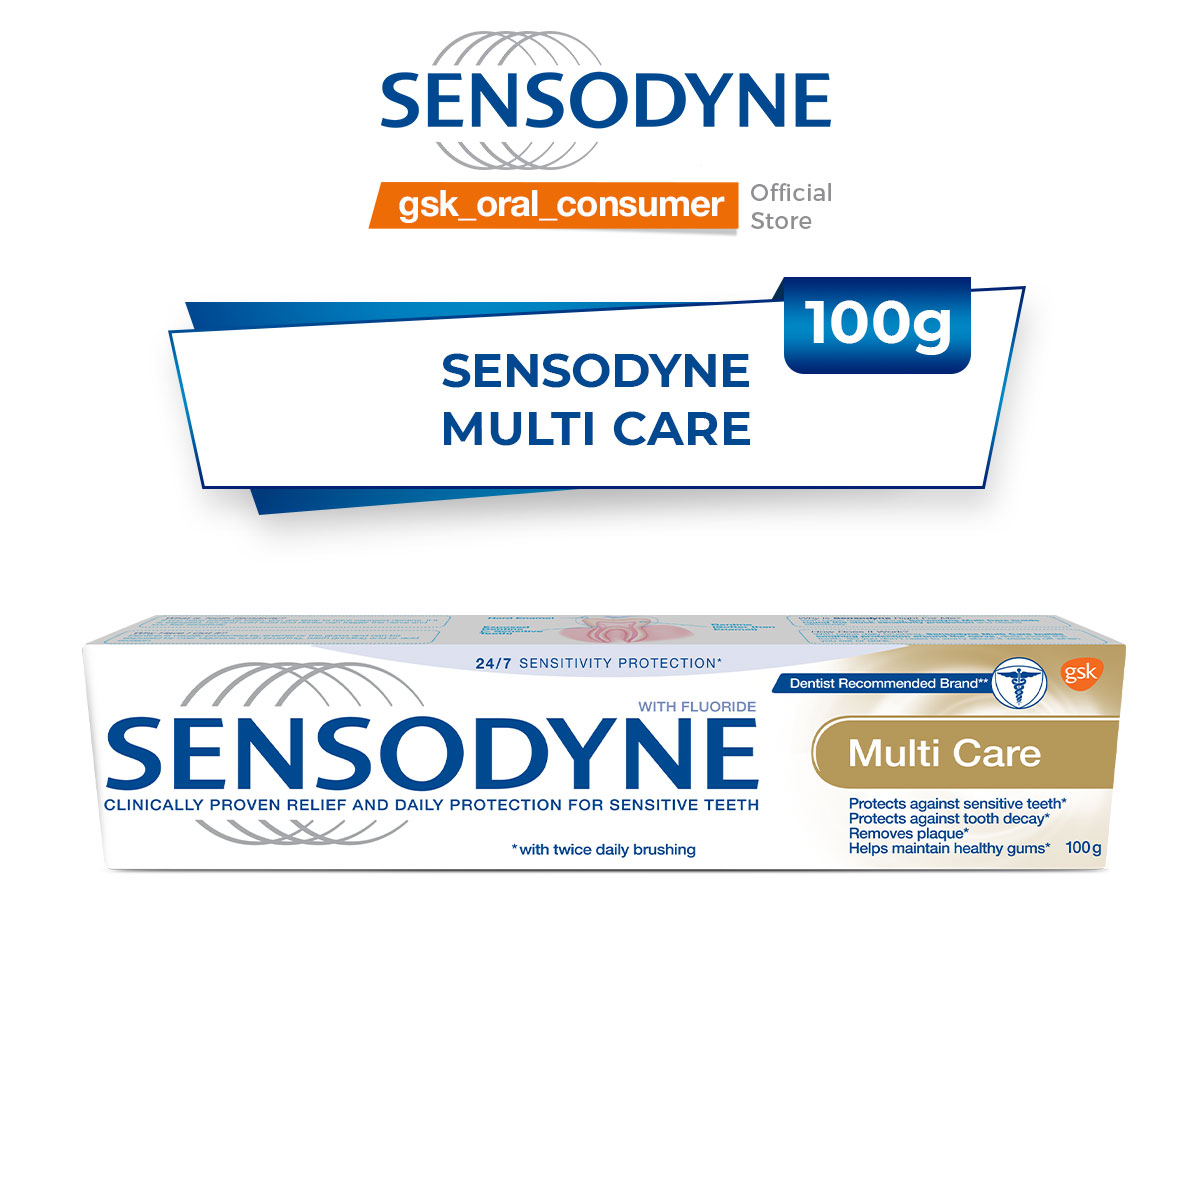 Sensodyne Multi Care Bảo Vệ Toàn Diện